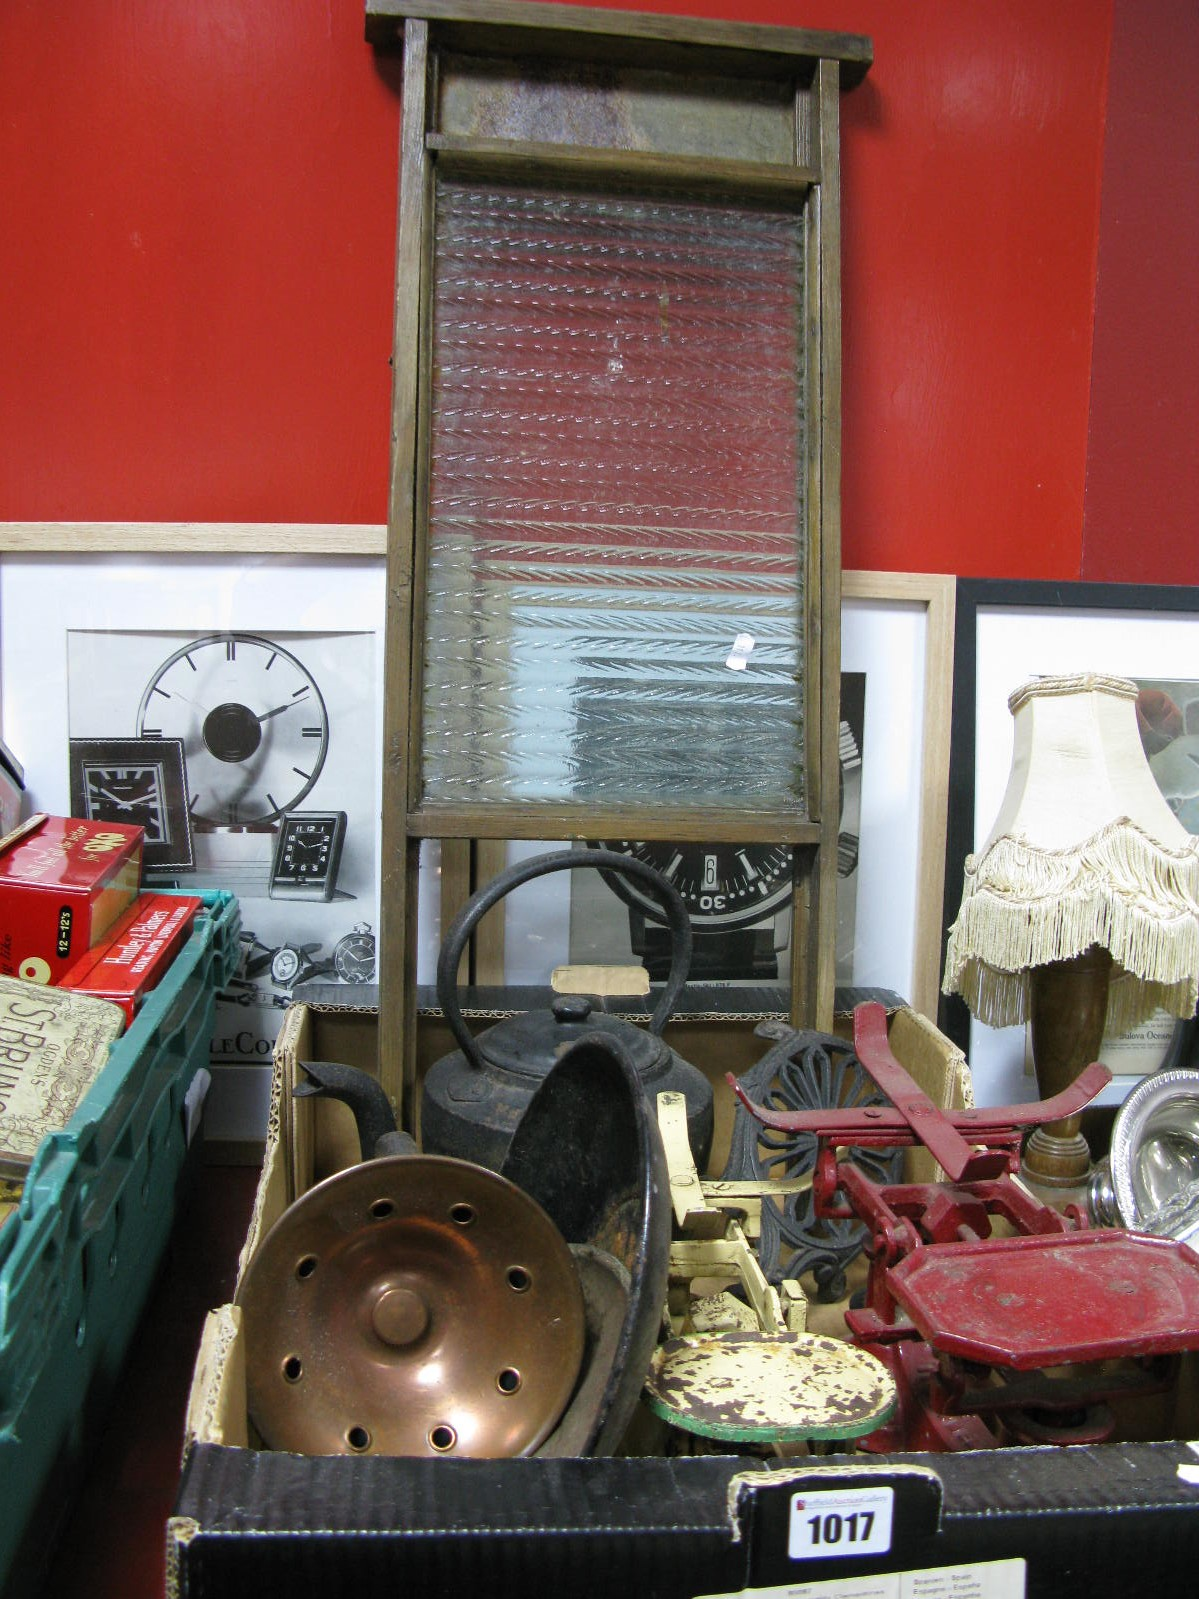 Lot 1017 - A XIX Century Cast Iron Kettle, trivets, scales, flat iron, scrub board, etc:- One Box